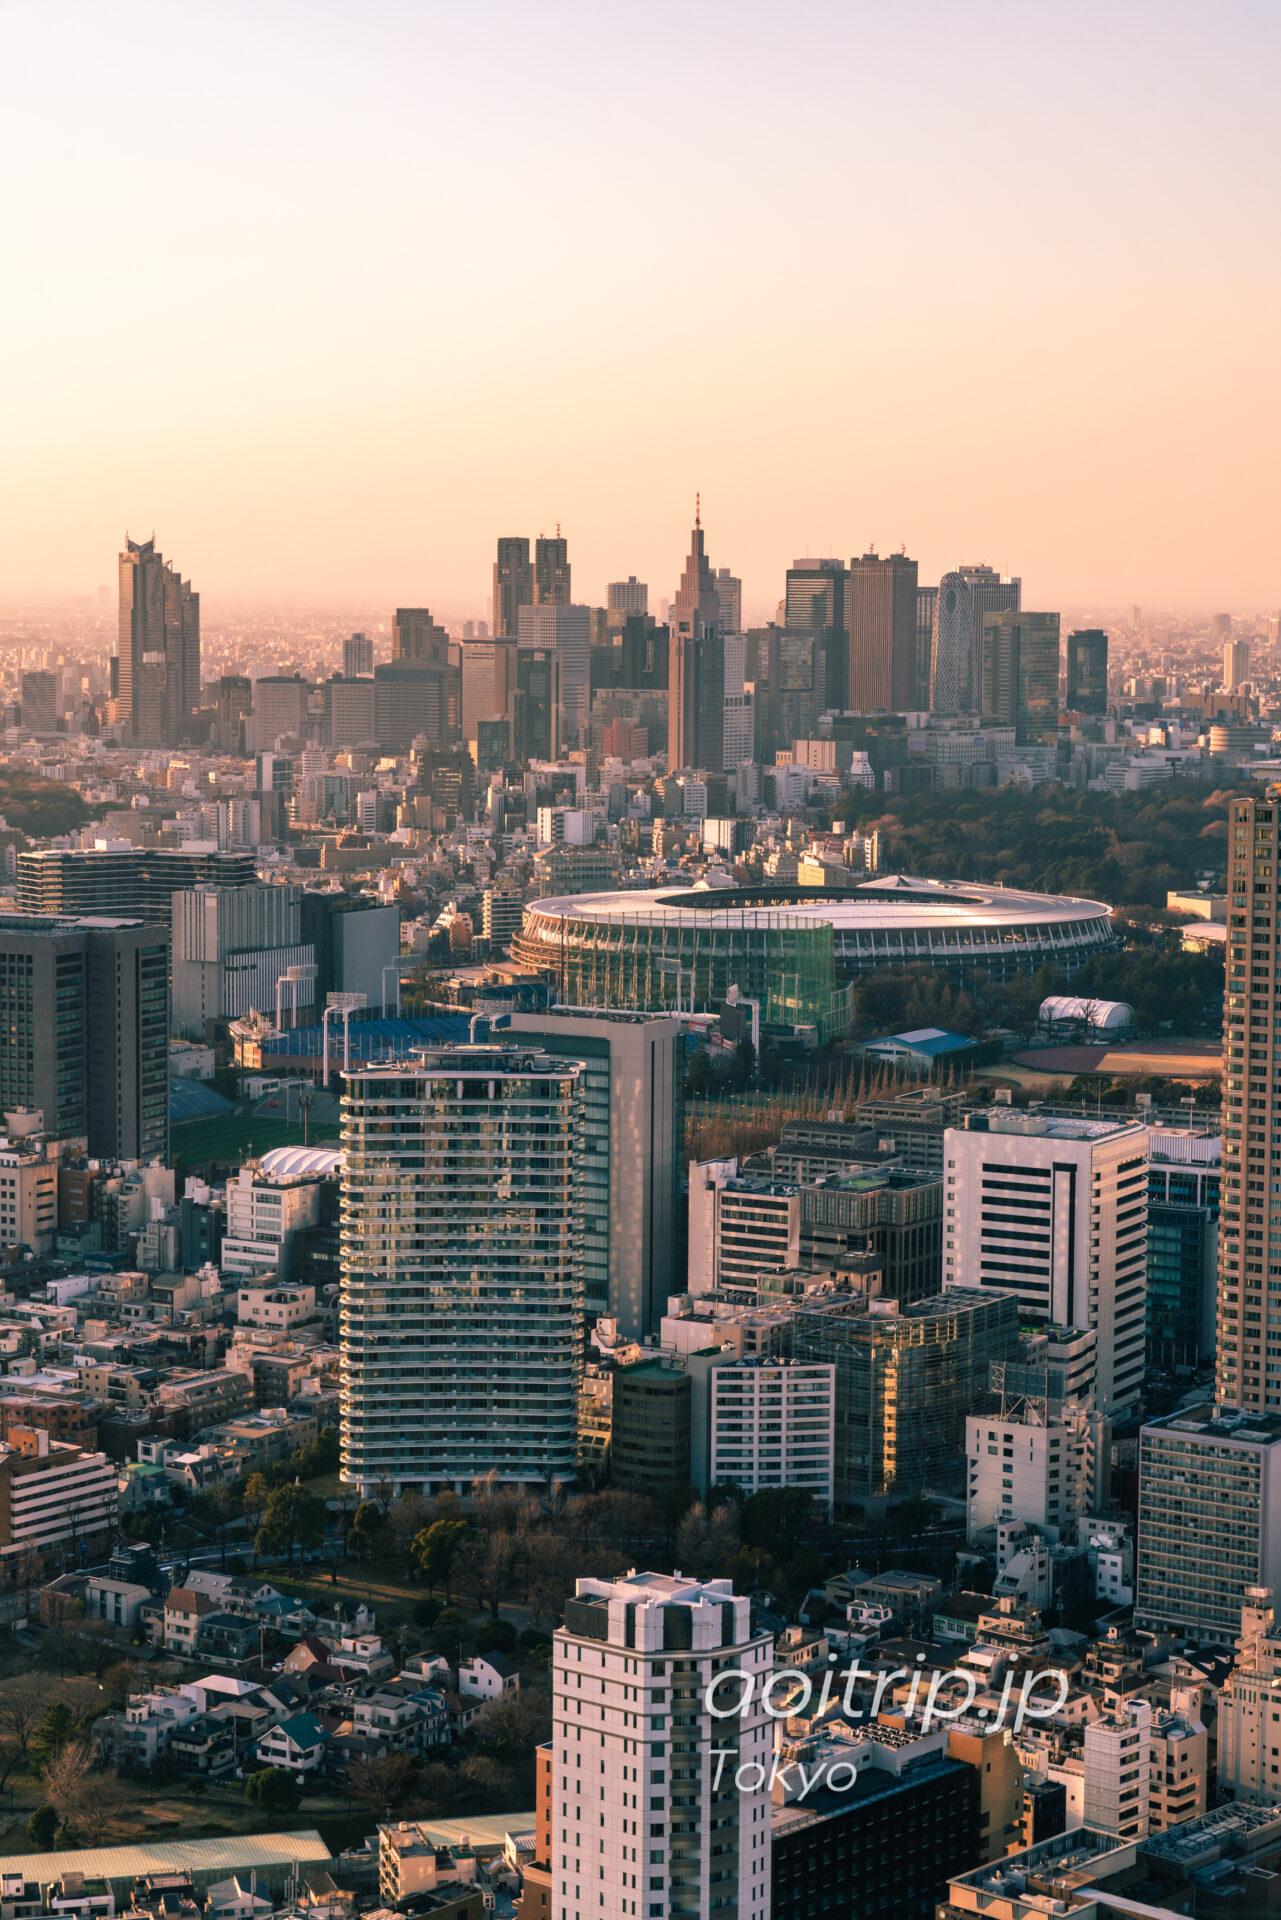 Tokyo Skyline ザ リッツカールトン東京から望む新宿副都心と国立競技場